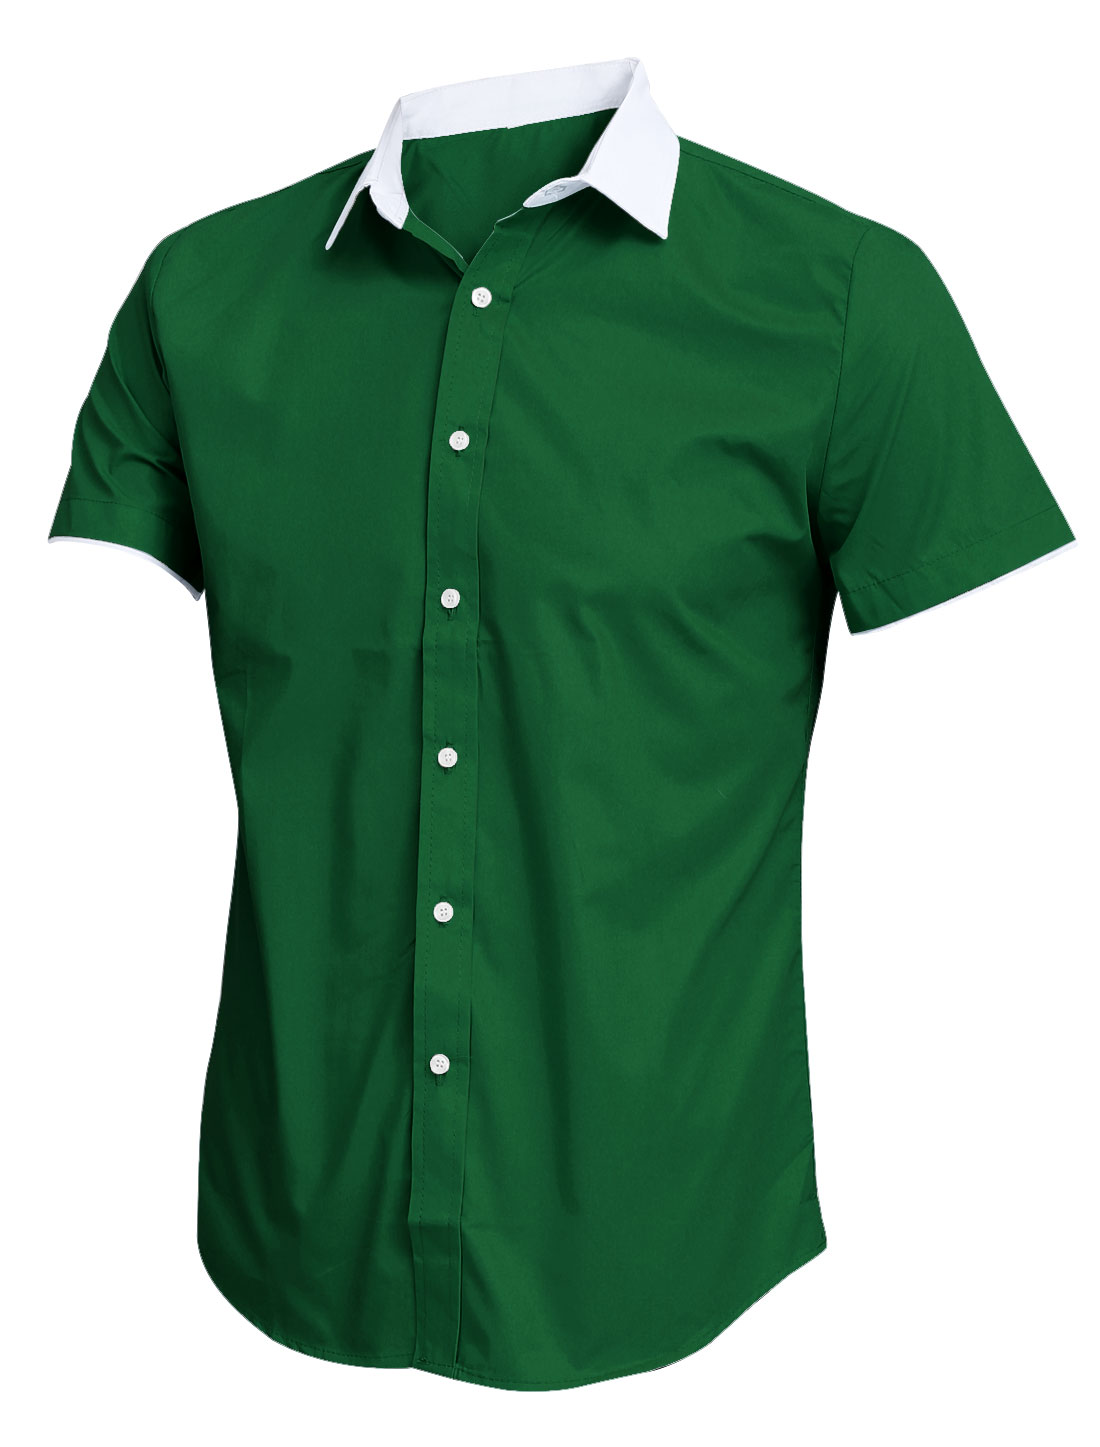 Men New Style Design Short Sleeve Button Up Dusty Green Shirt M